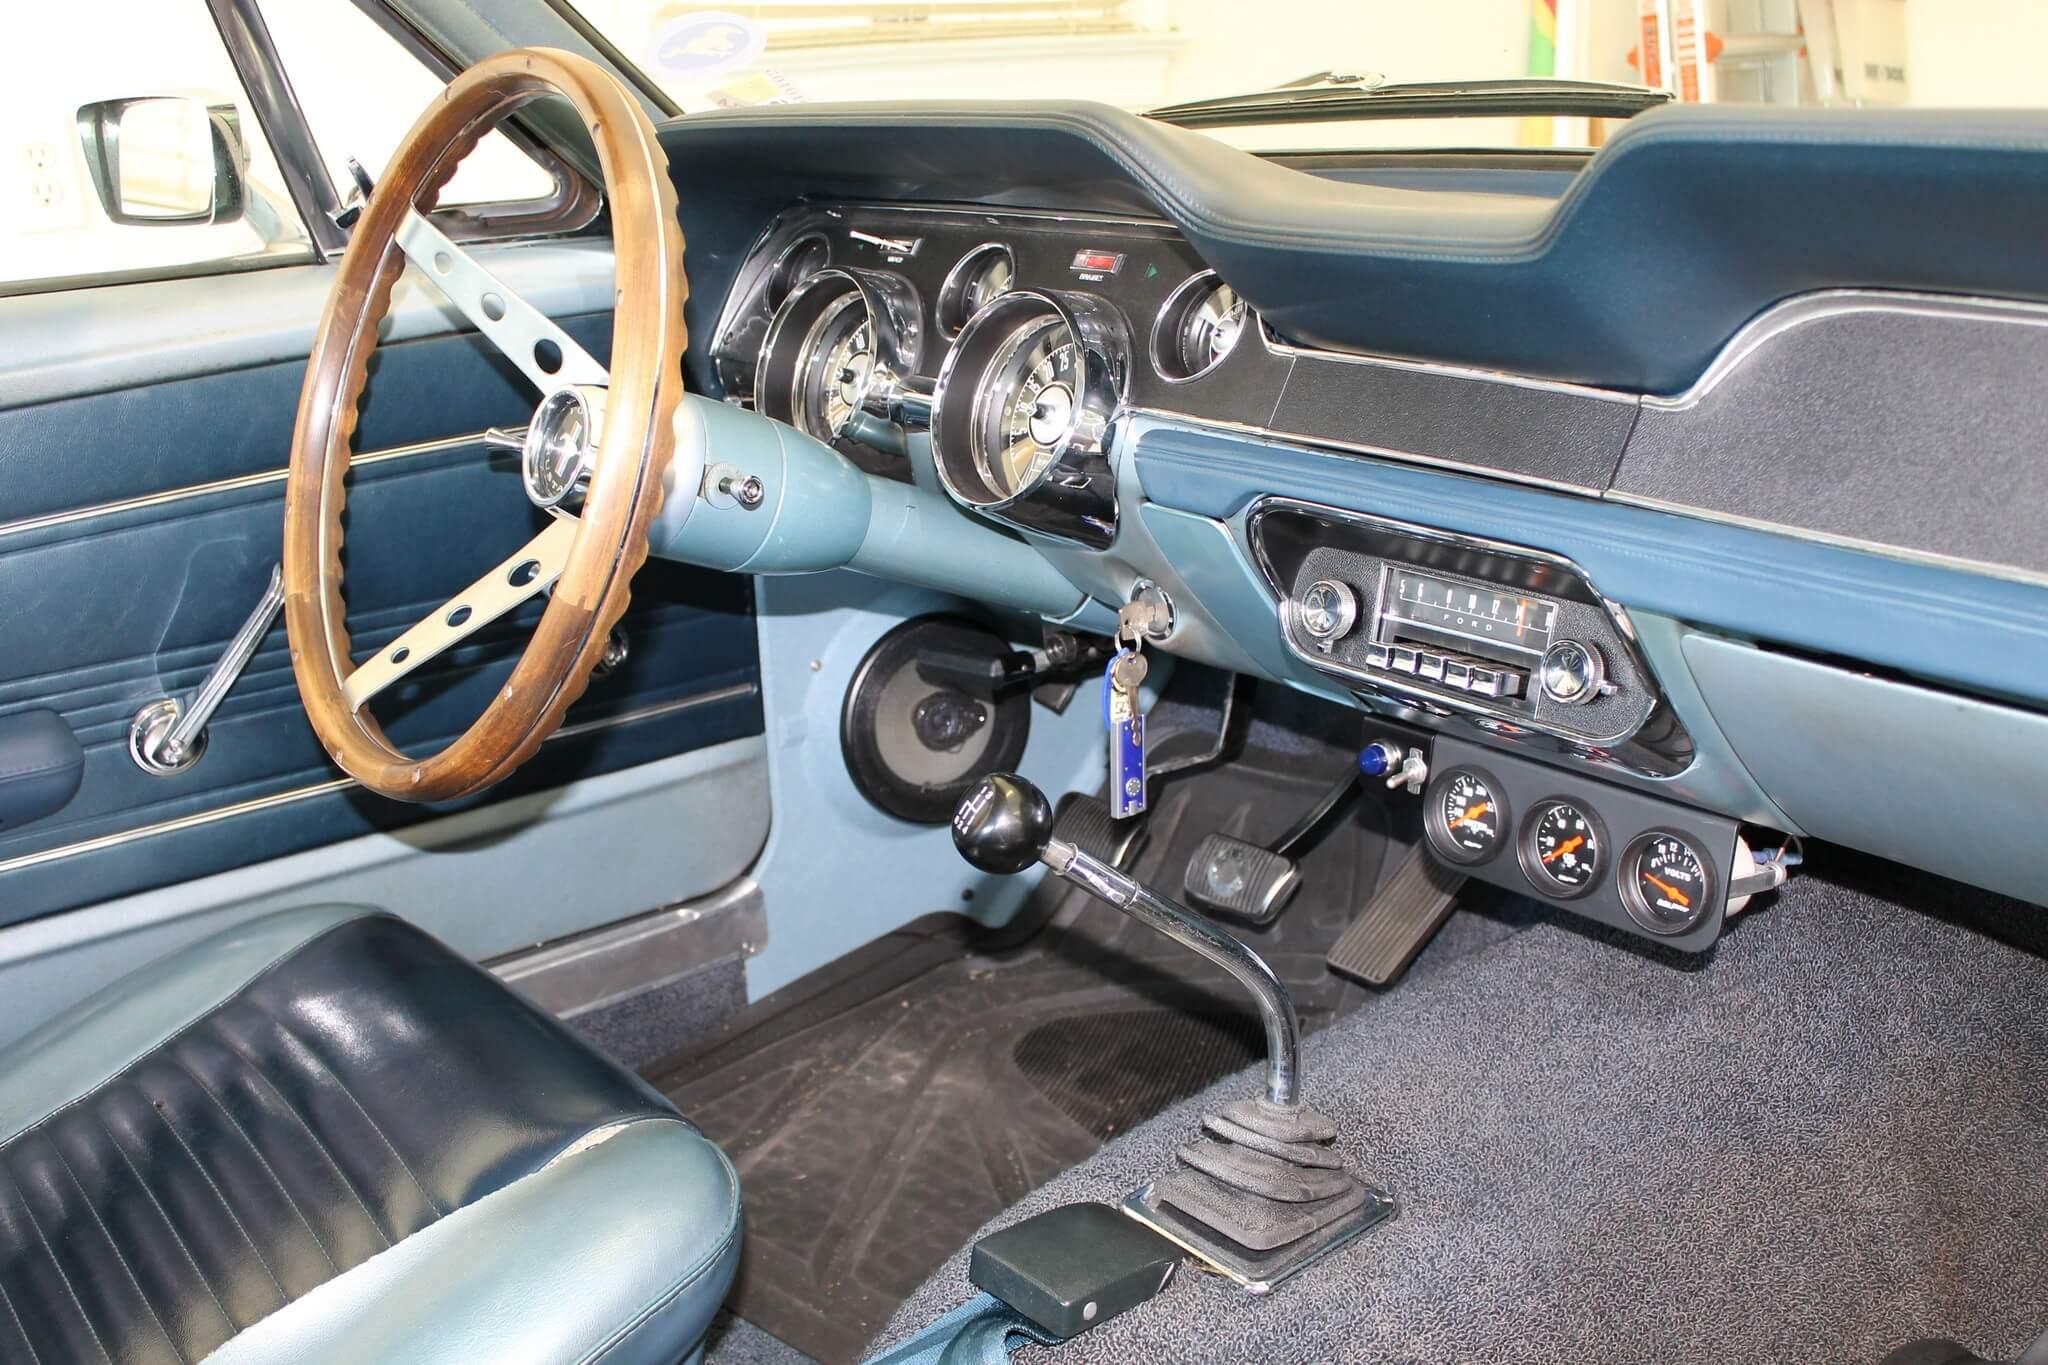 Tom Hennig - Concord, NC - 1967 Ford Mustang